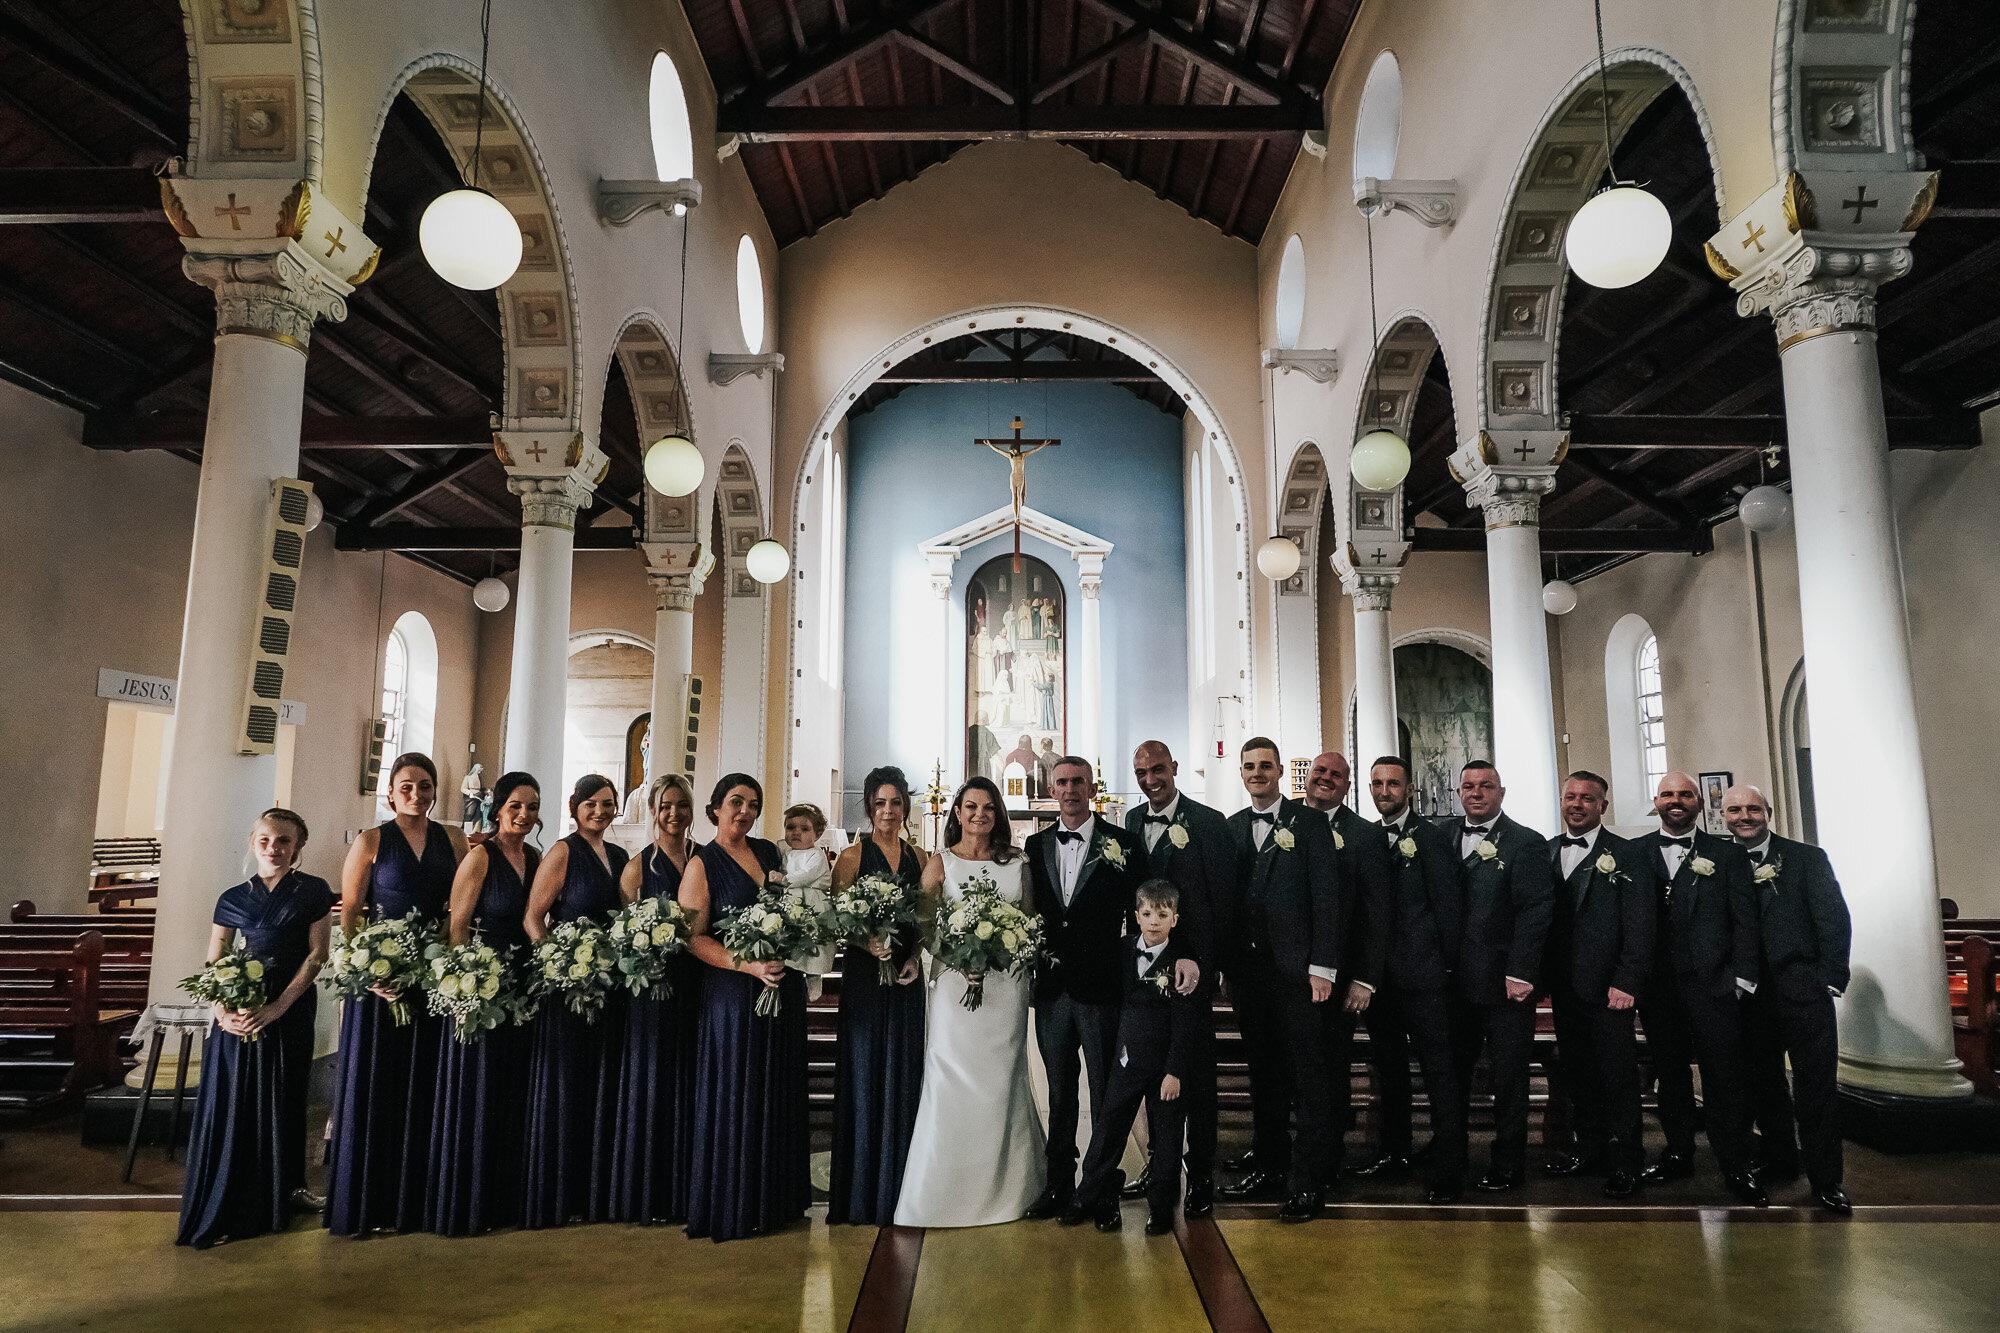 Clontarf Caste wedding photographer Wedding Photography dublin ireland wedding photographer (29 of 58).jpg